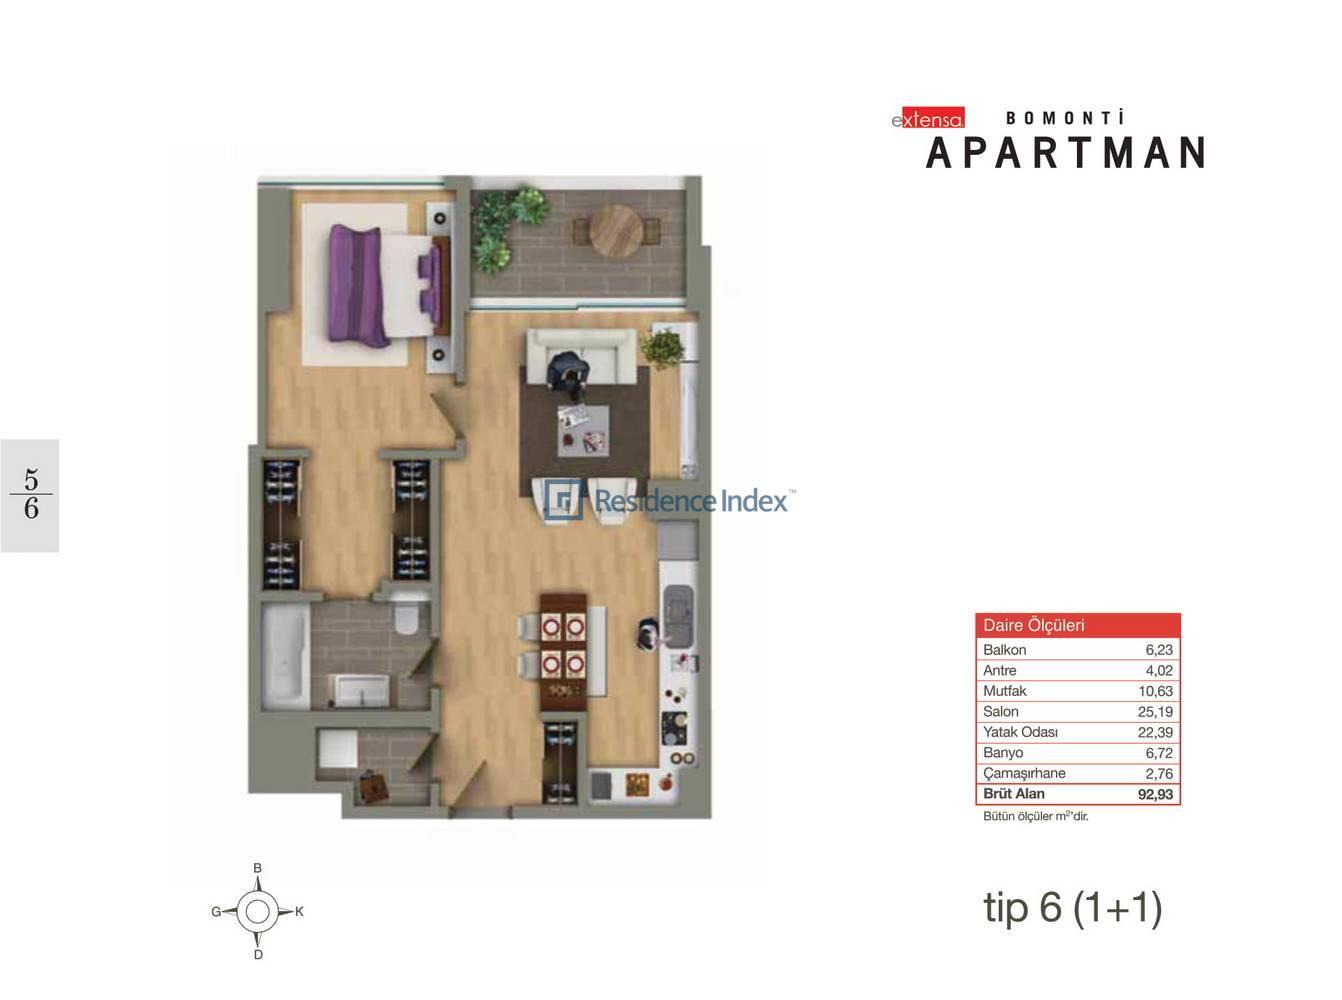 Bomonti Apartmanı Tip 6